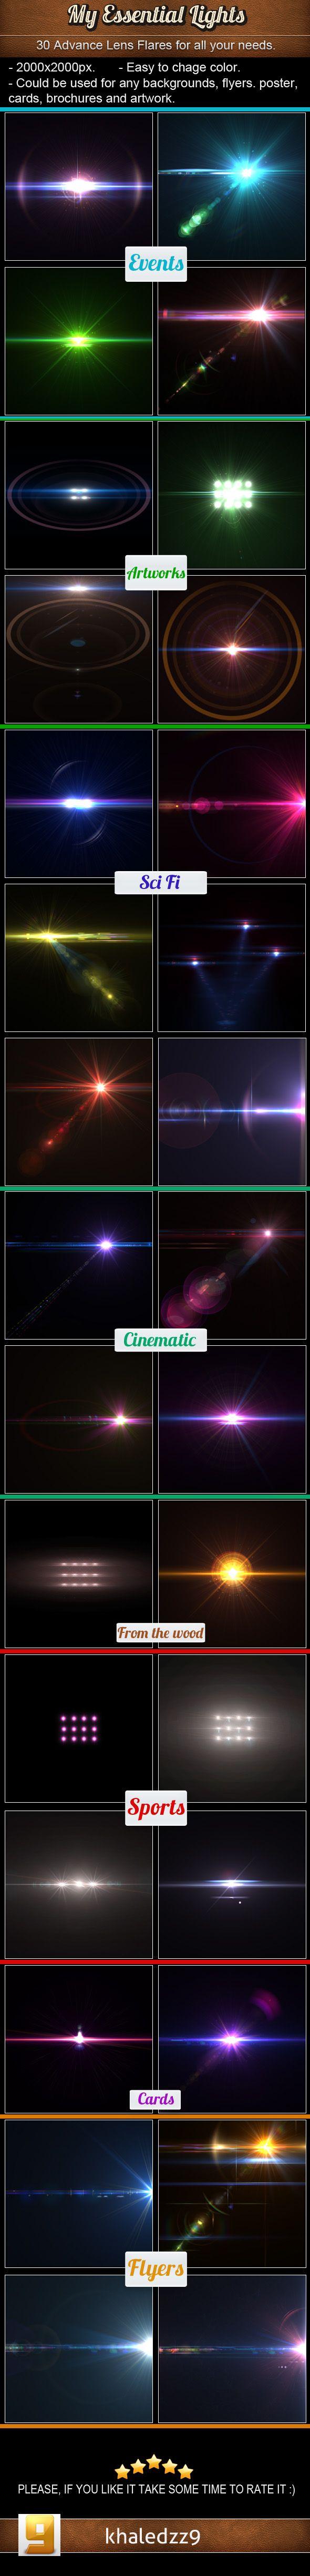 My Essential Lights by khaledzz9.deviantart.com on @deviantART